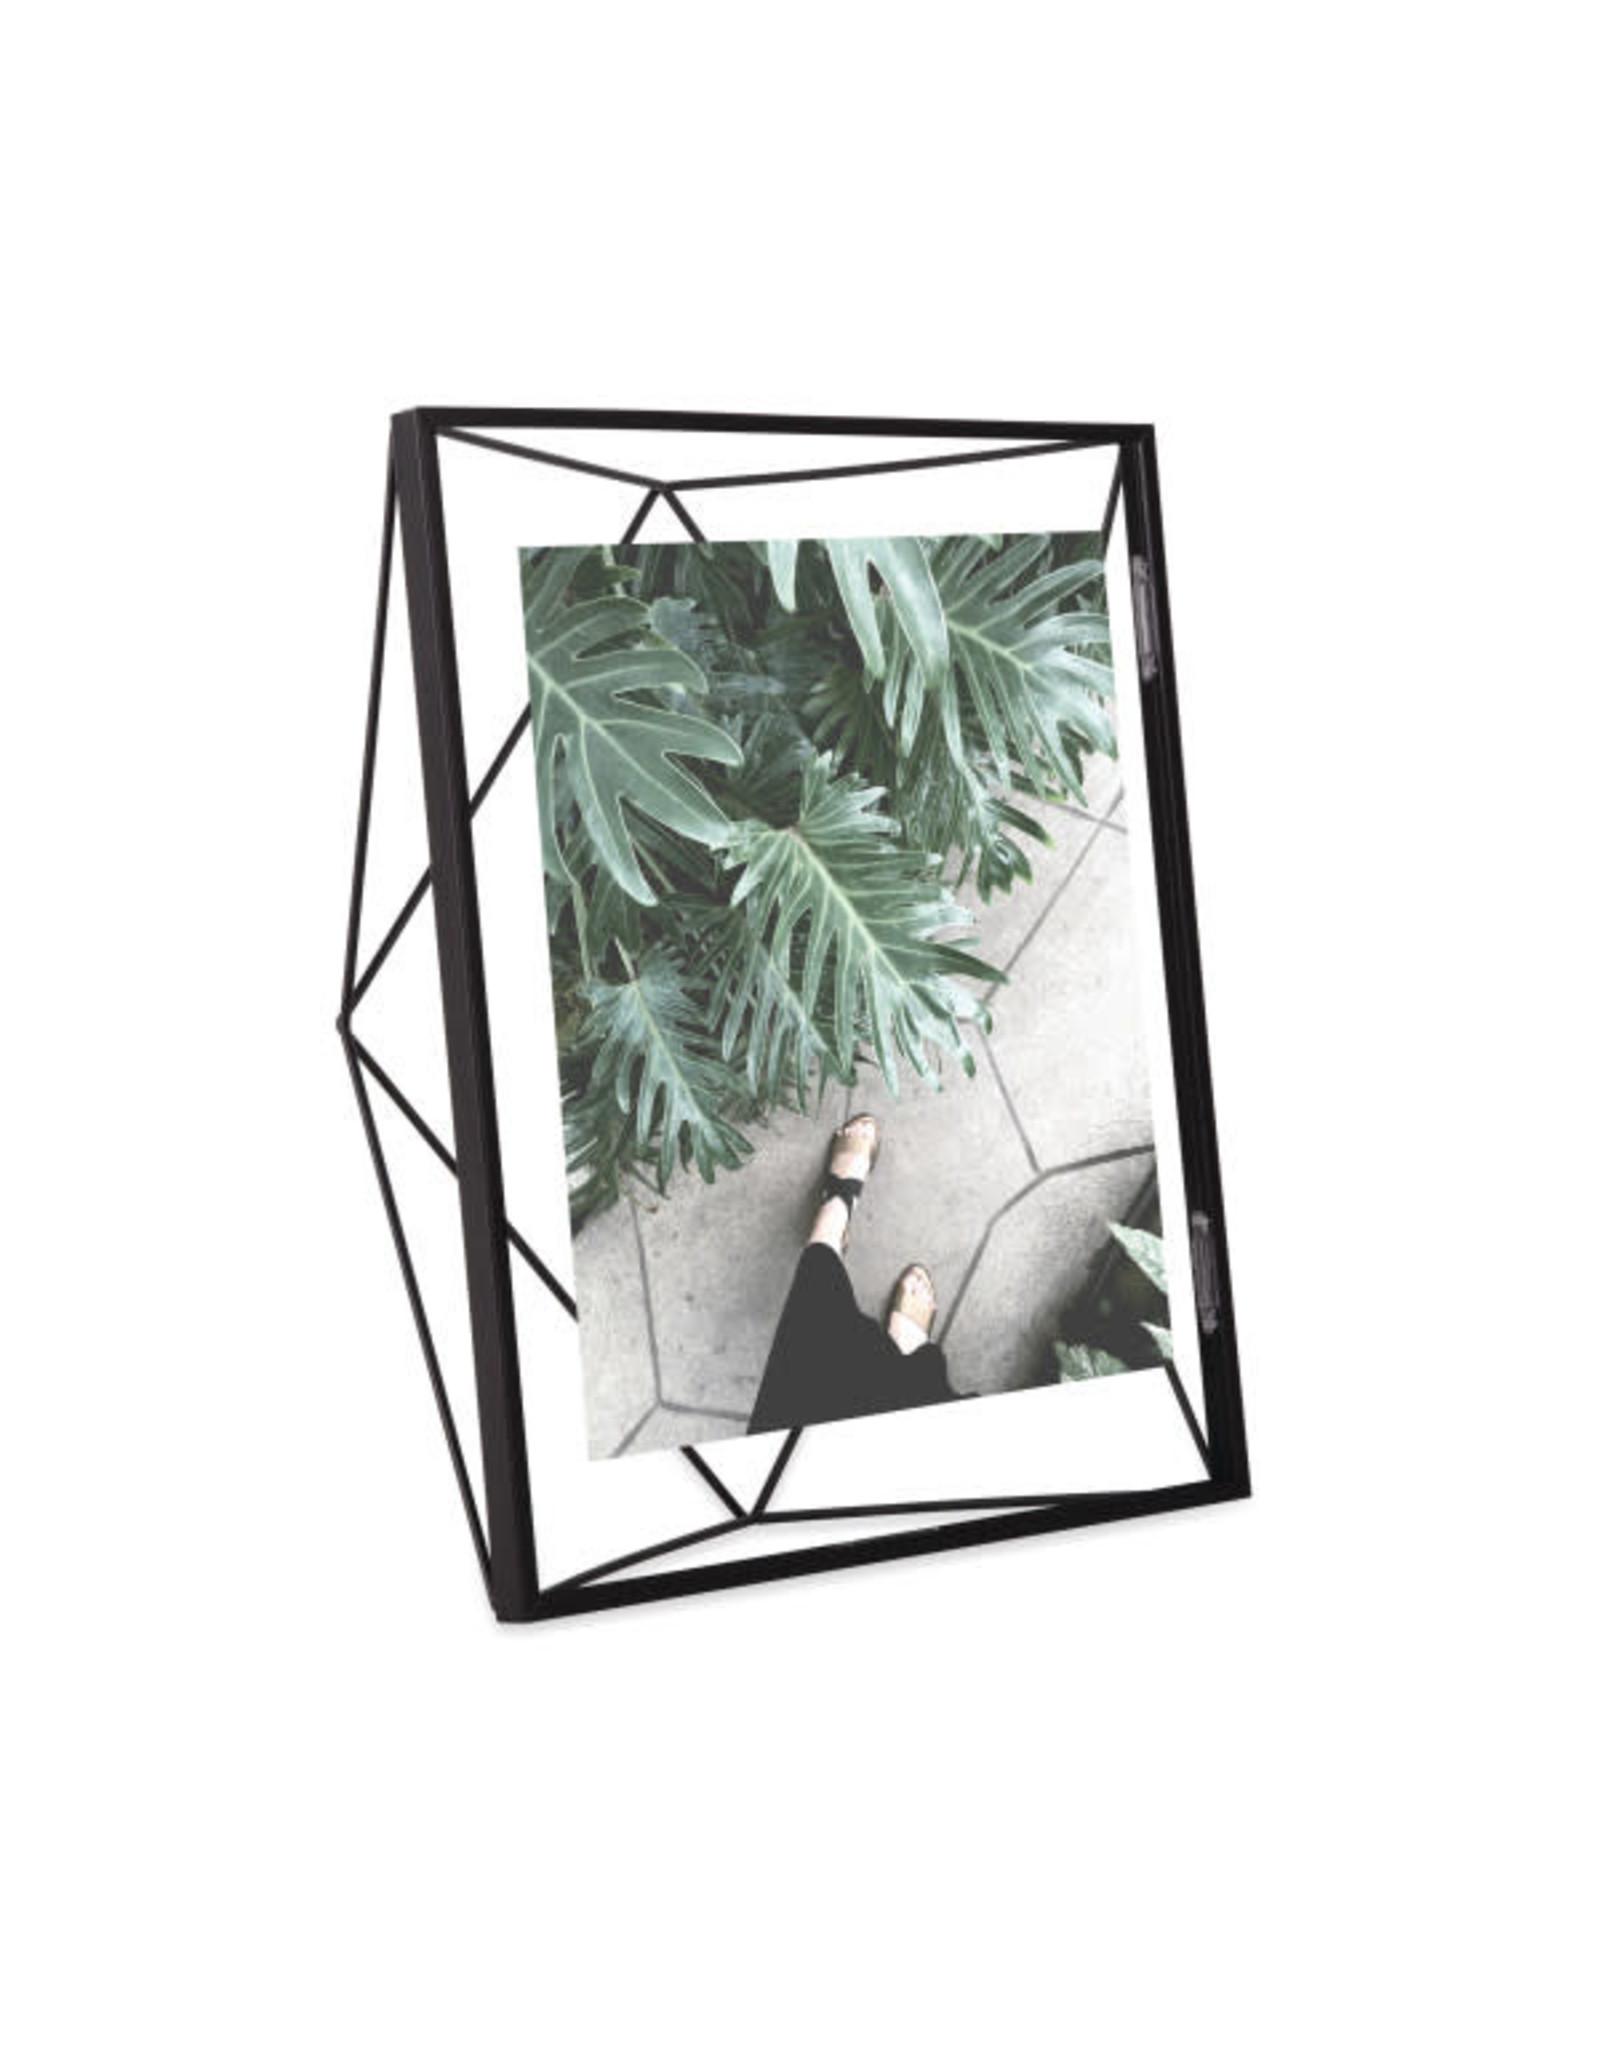 Umbra photo frame - prisma 20x25 (black)